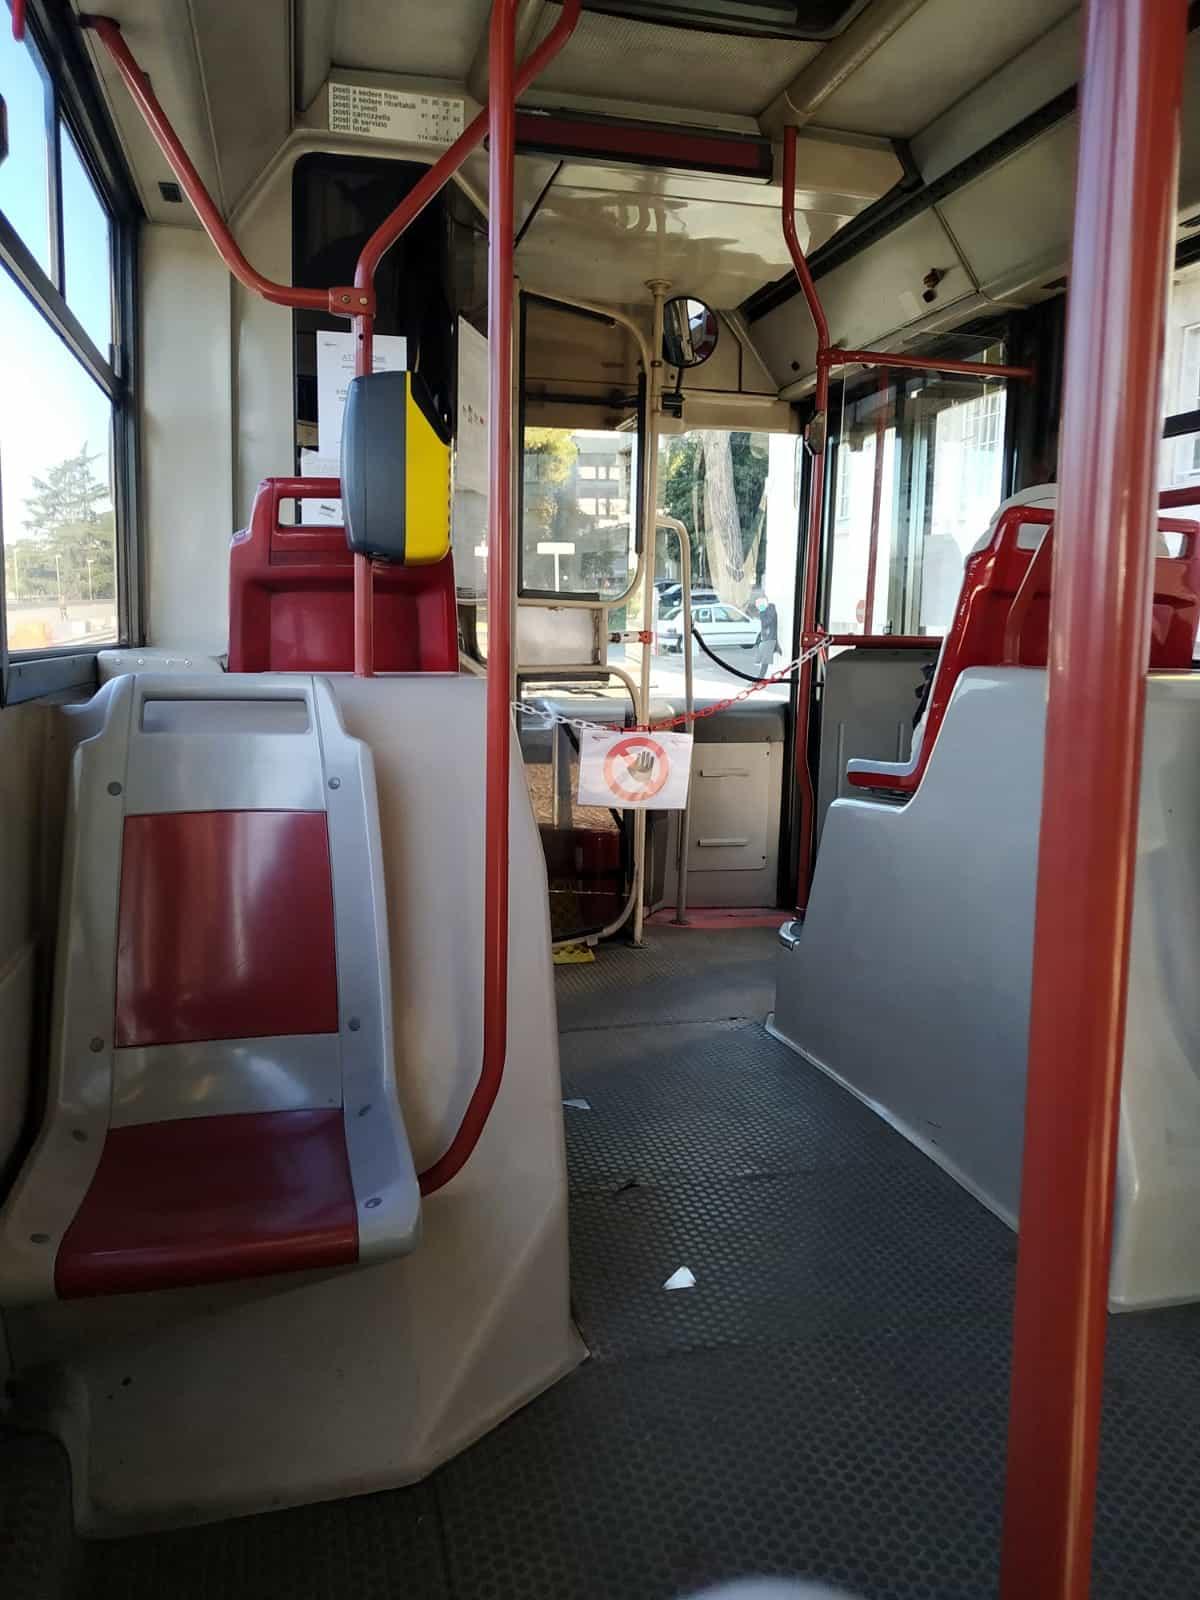 autobus vuoto-2